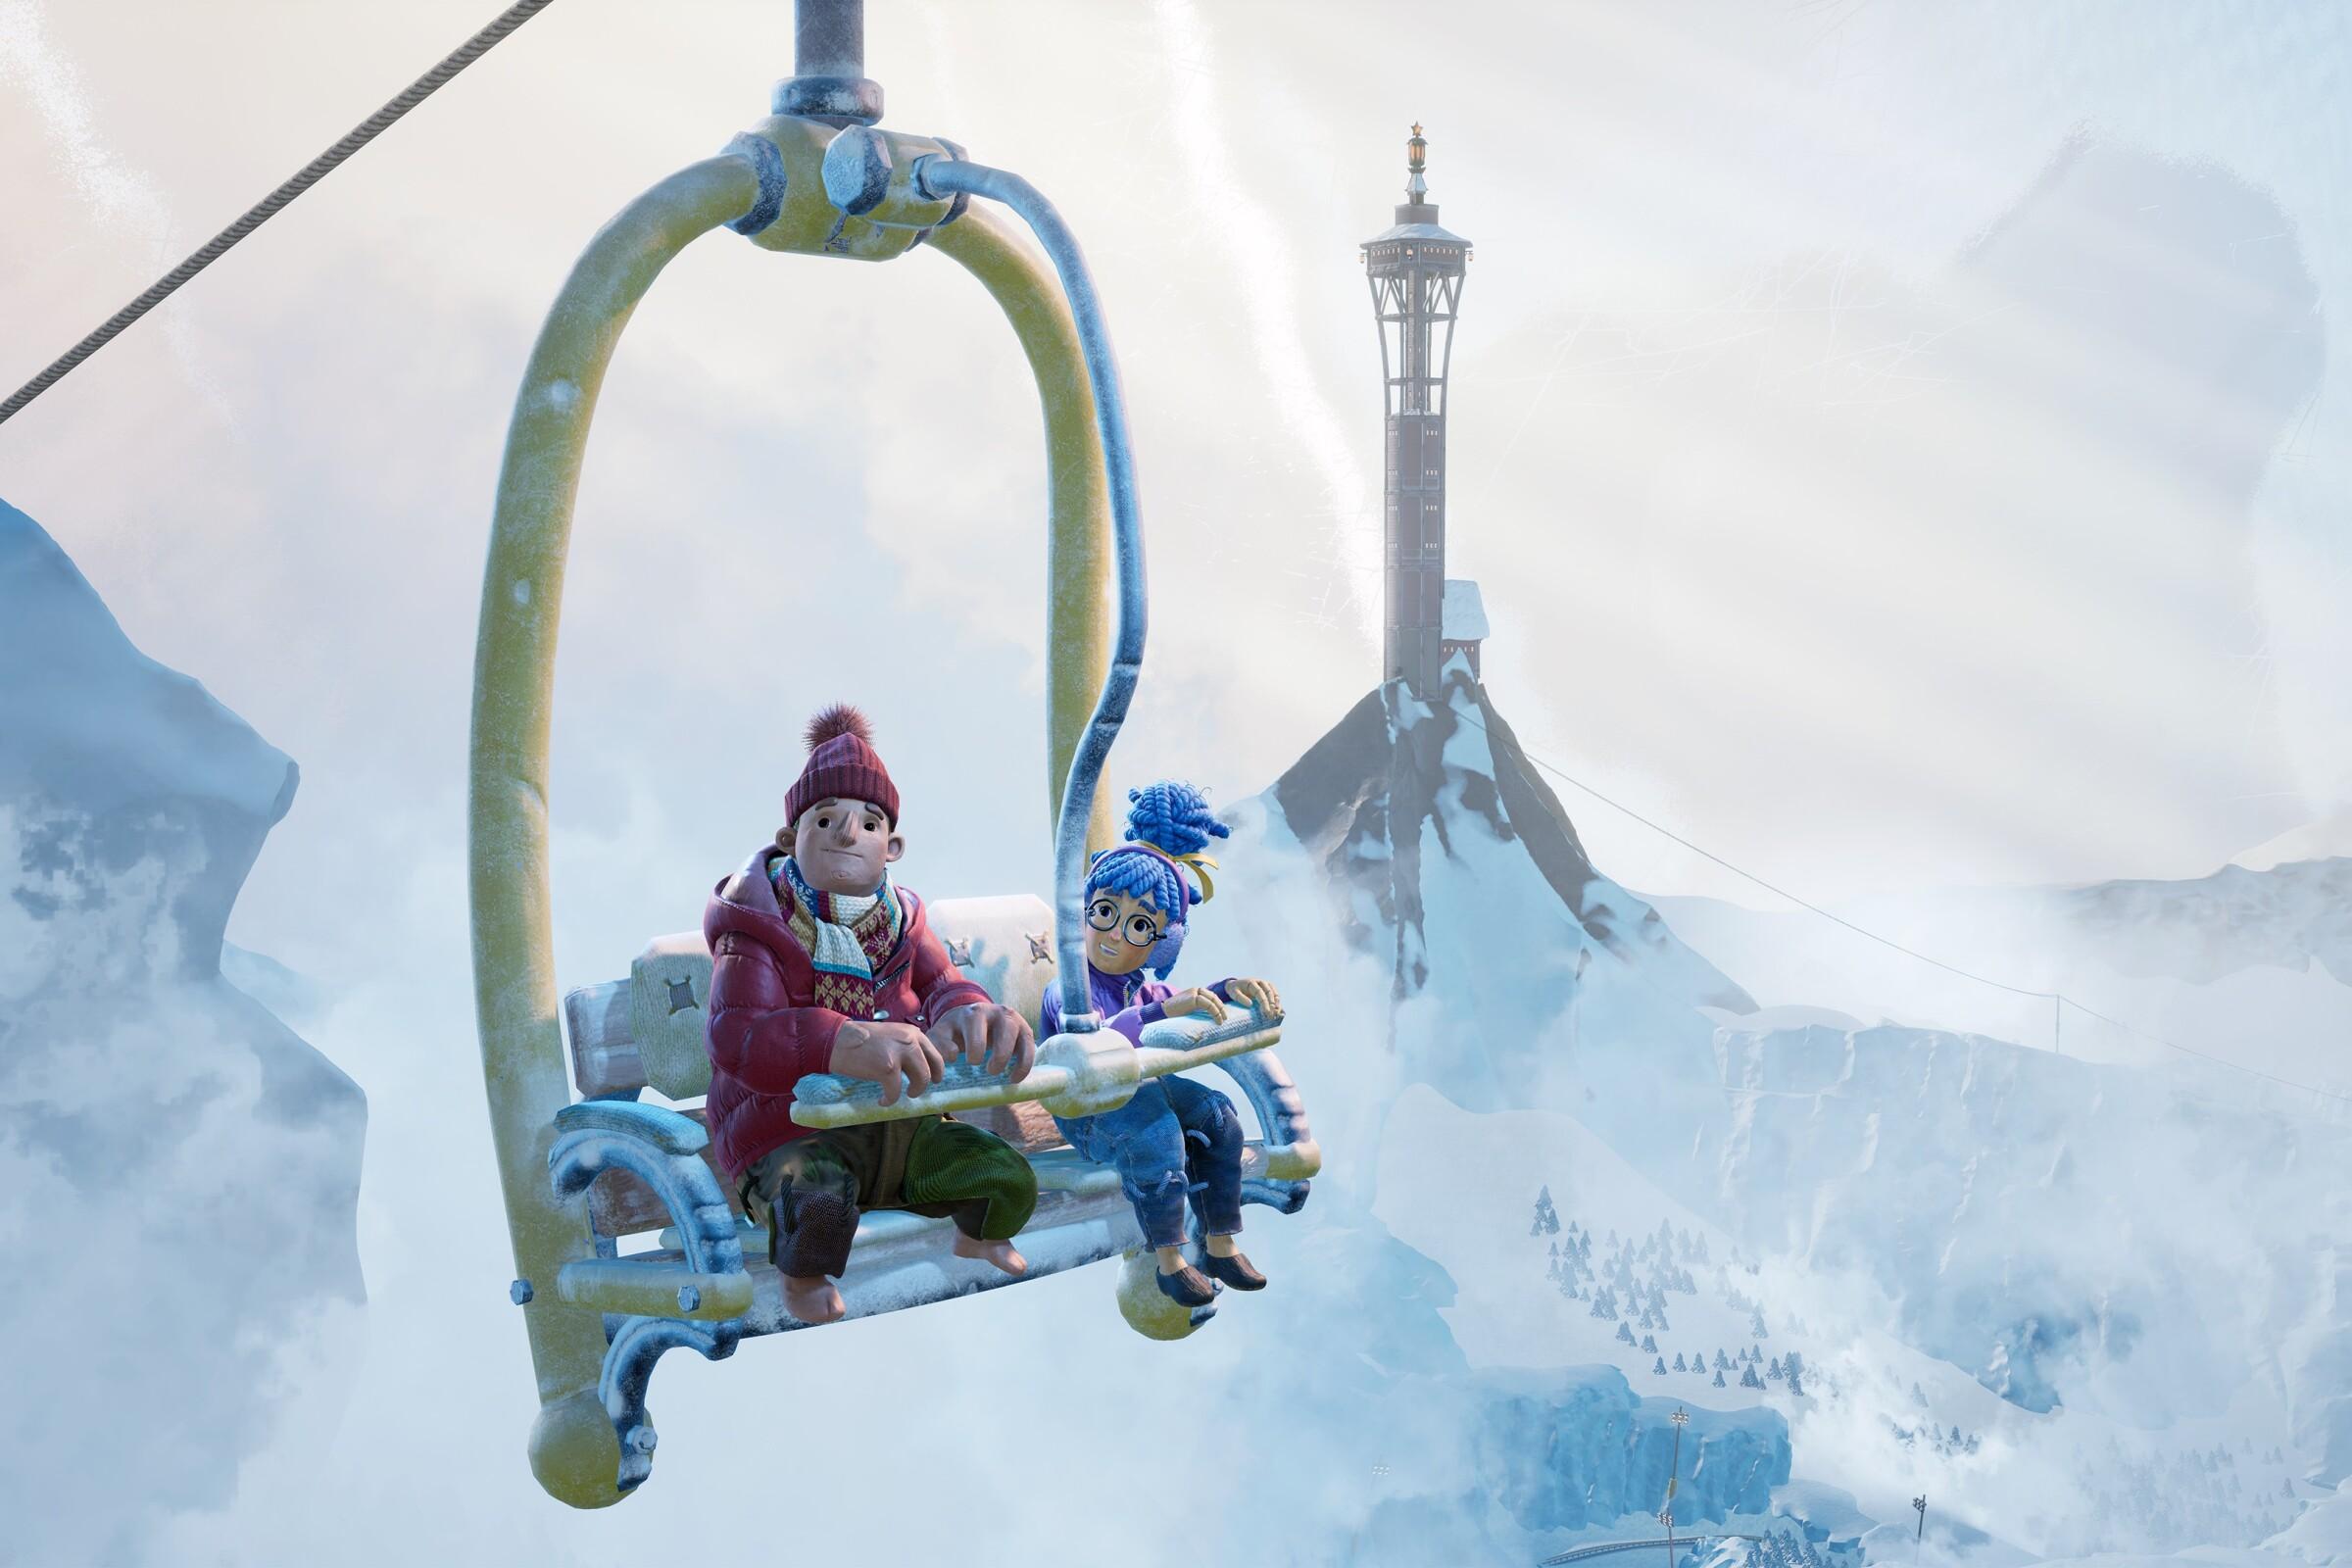 Animated couple on a sky lift